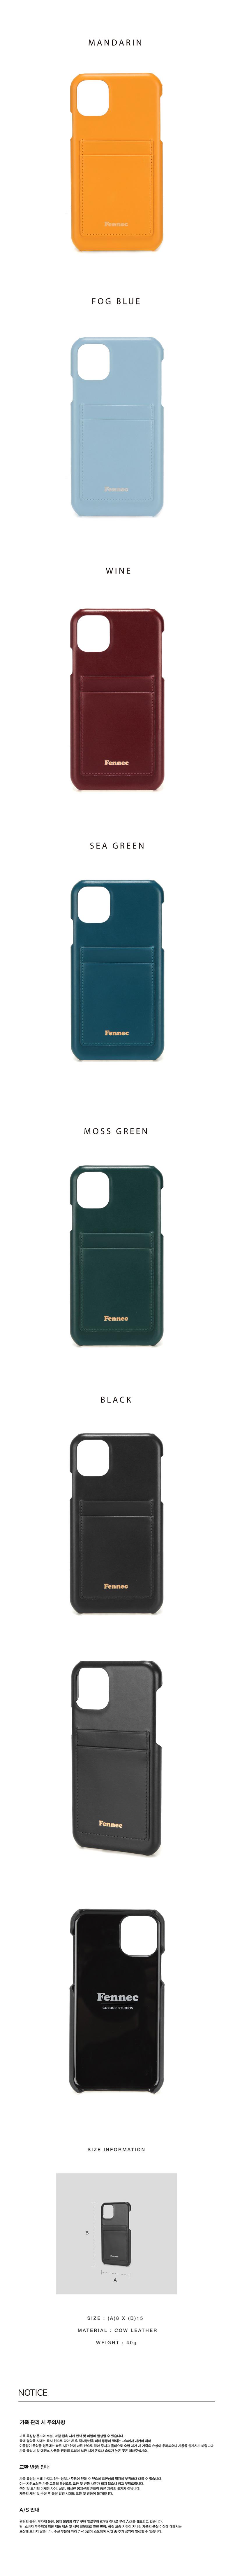 10x10-nu(all)-iphone-11pro.jpg